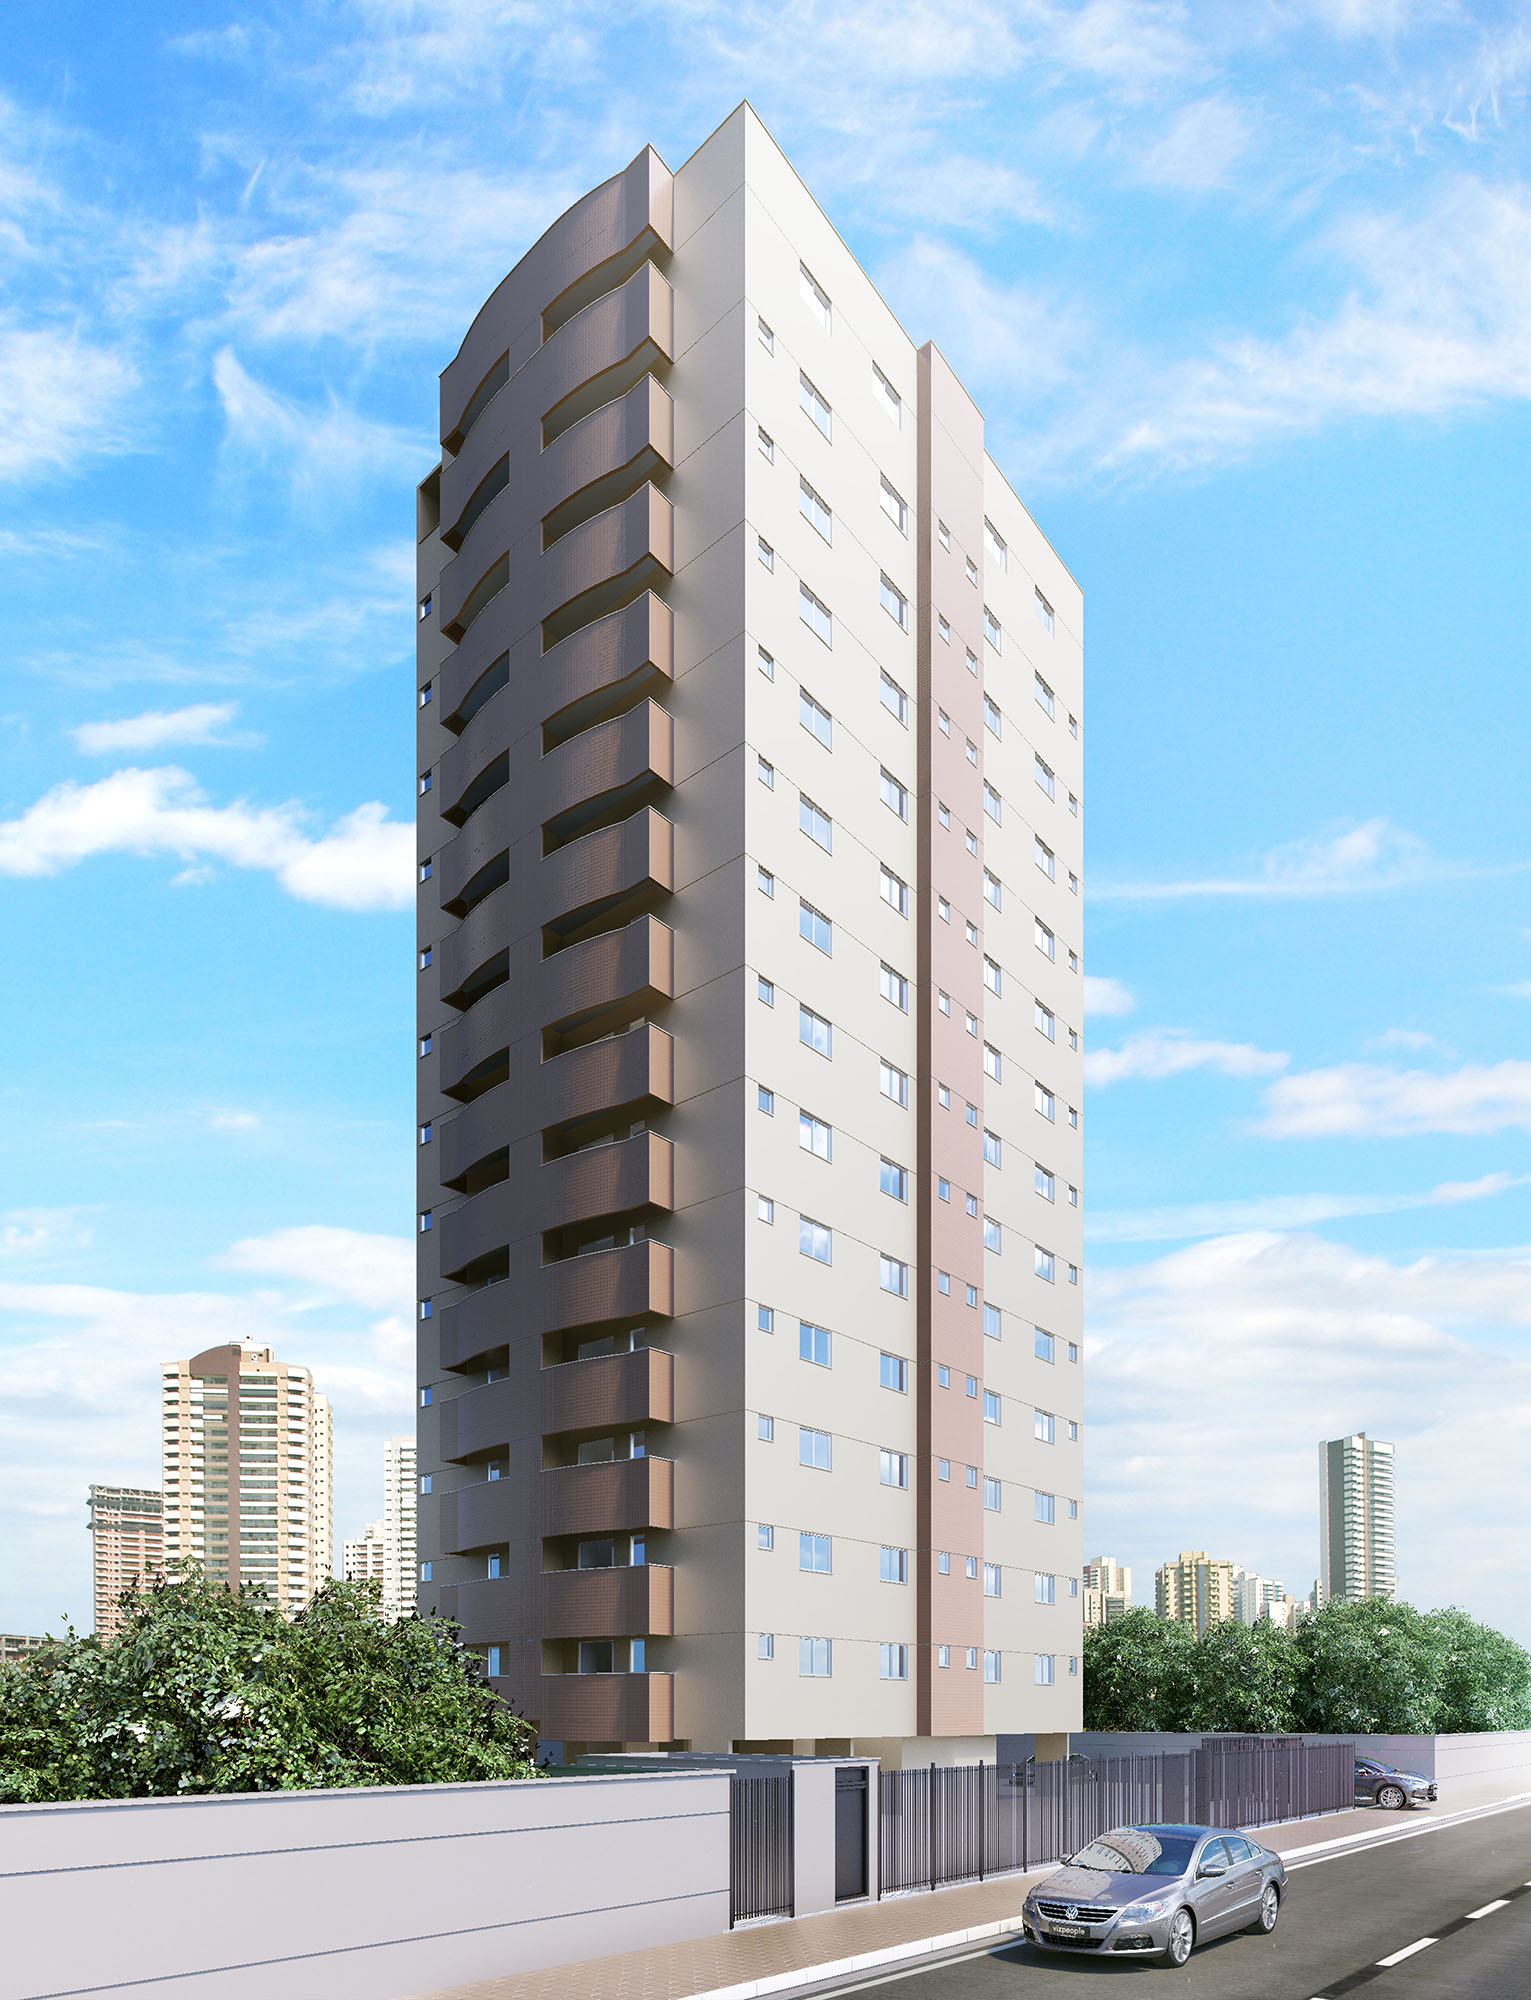 Perspectiva 3D - Edifício Residencial